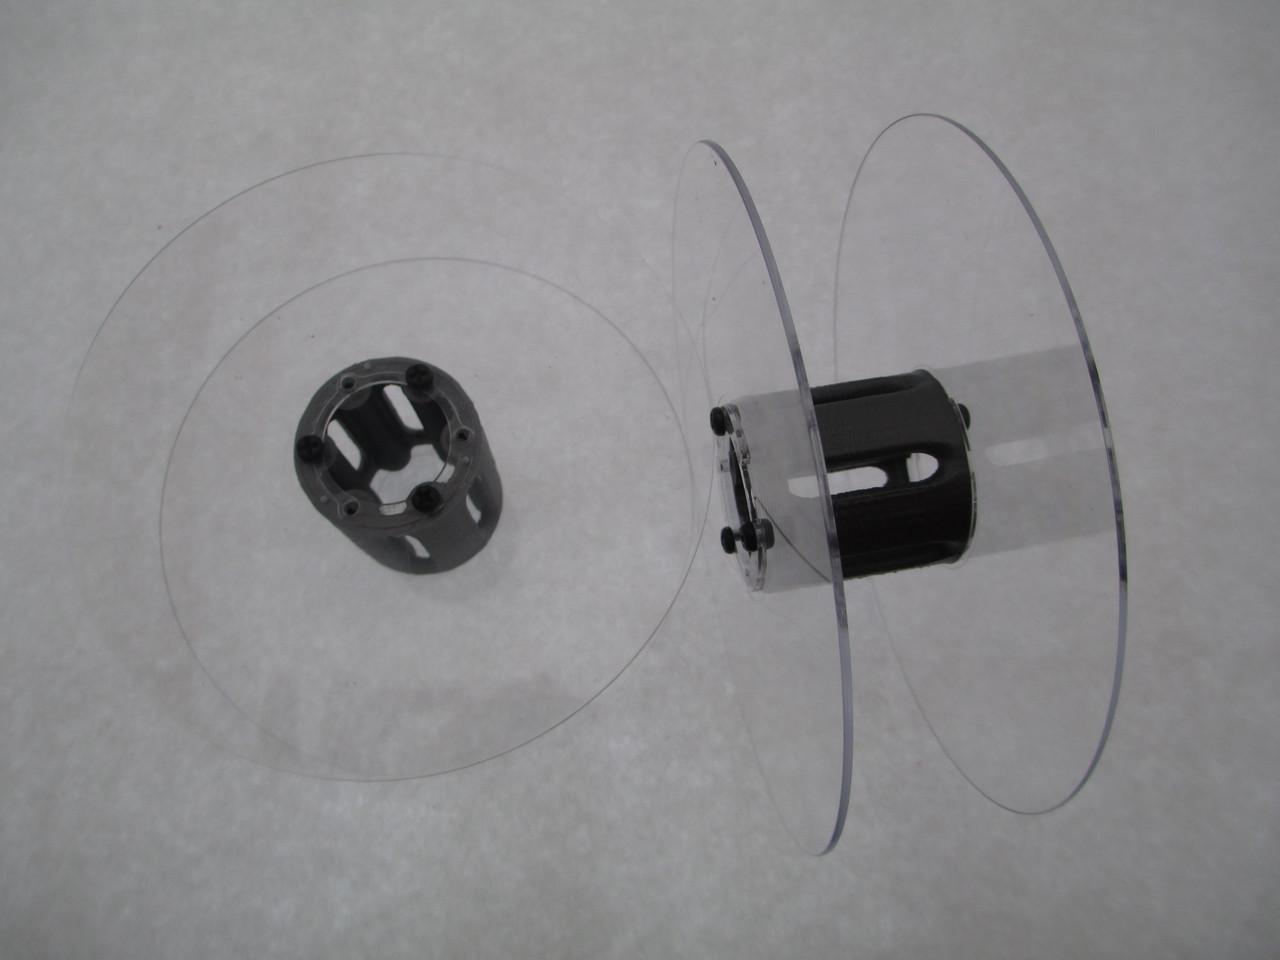 Катушка для мерных материалов : тесьма, ленты, нити, шнуры. Диаметр 121мм, диаметр катушки 35 мм, ширина 37 мм - Spark beadS в Киевской области